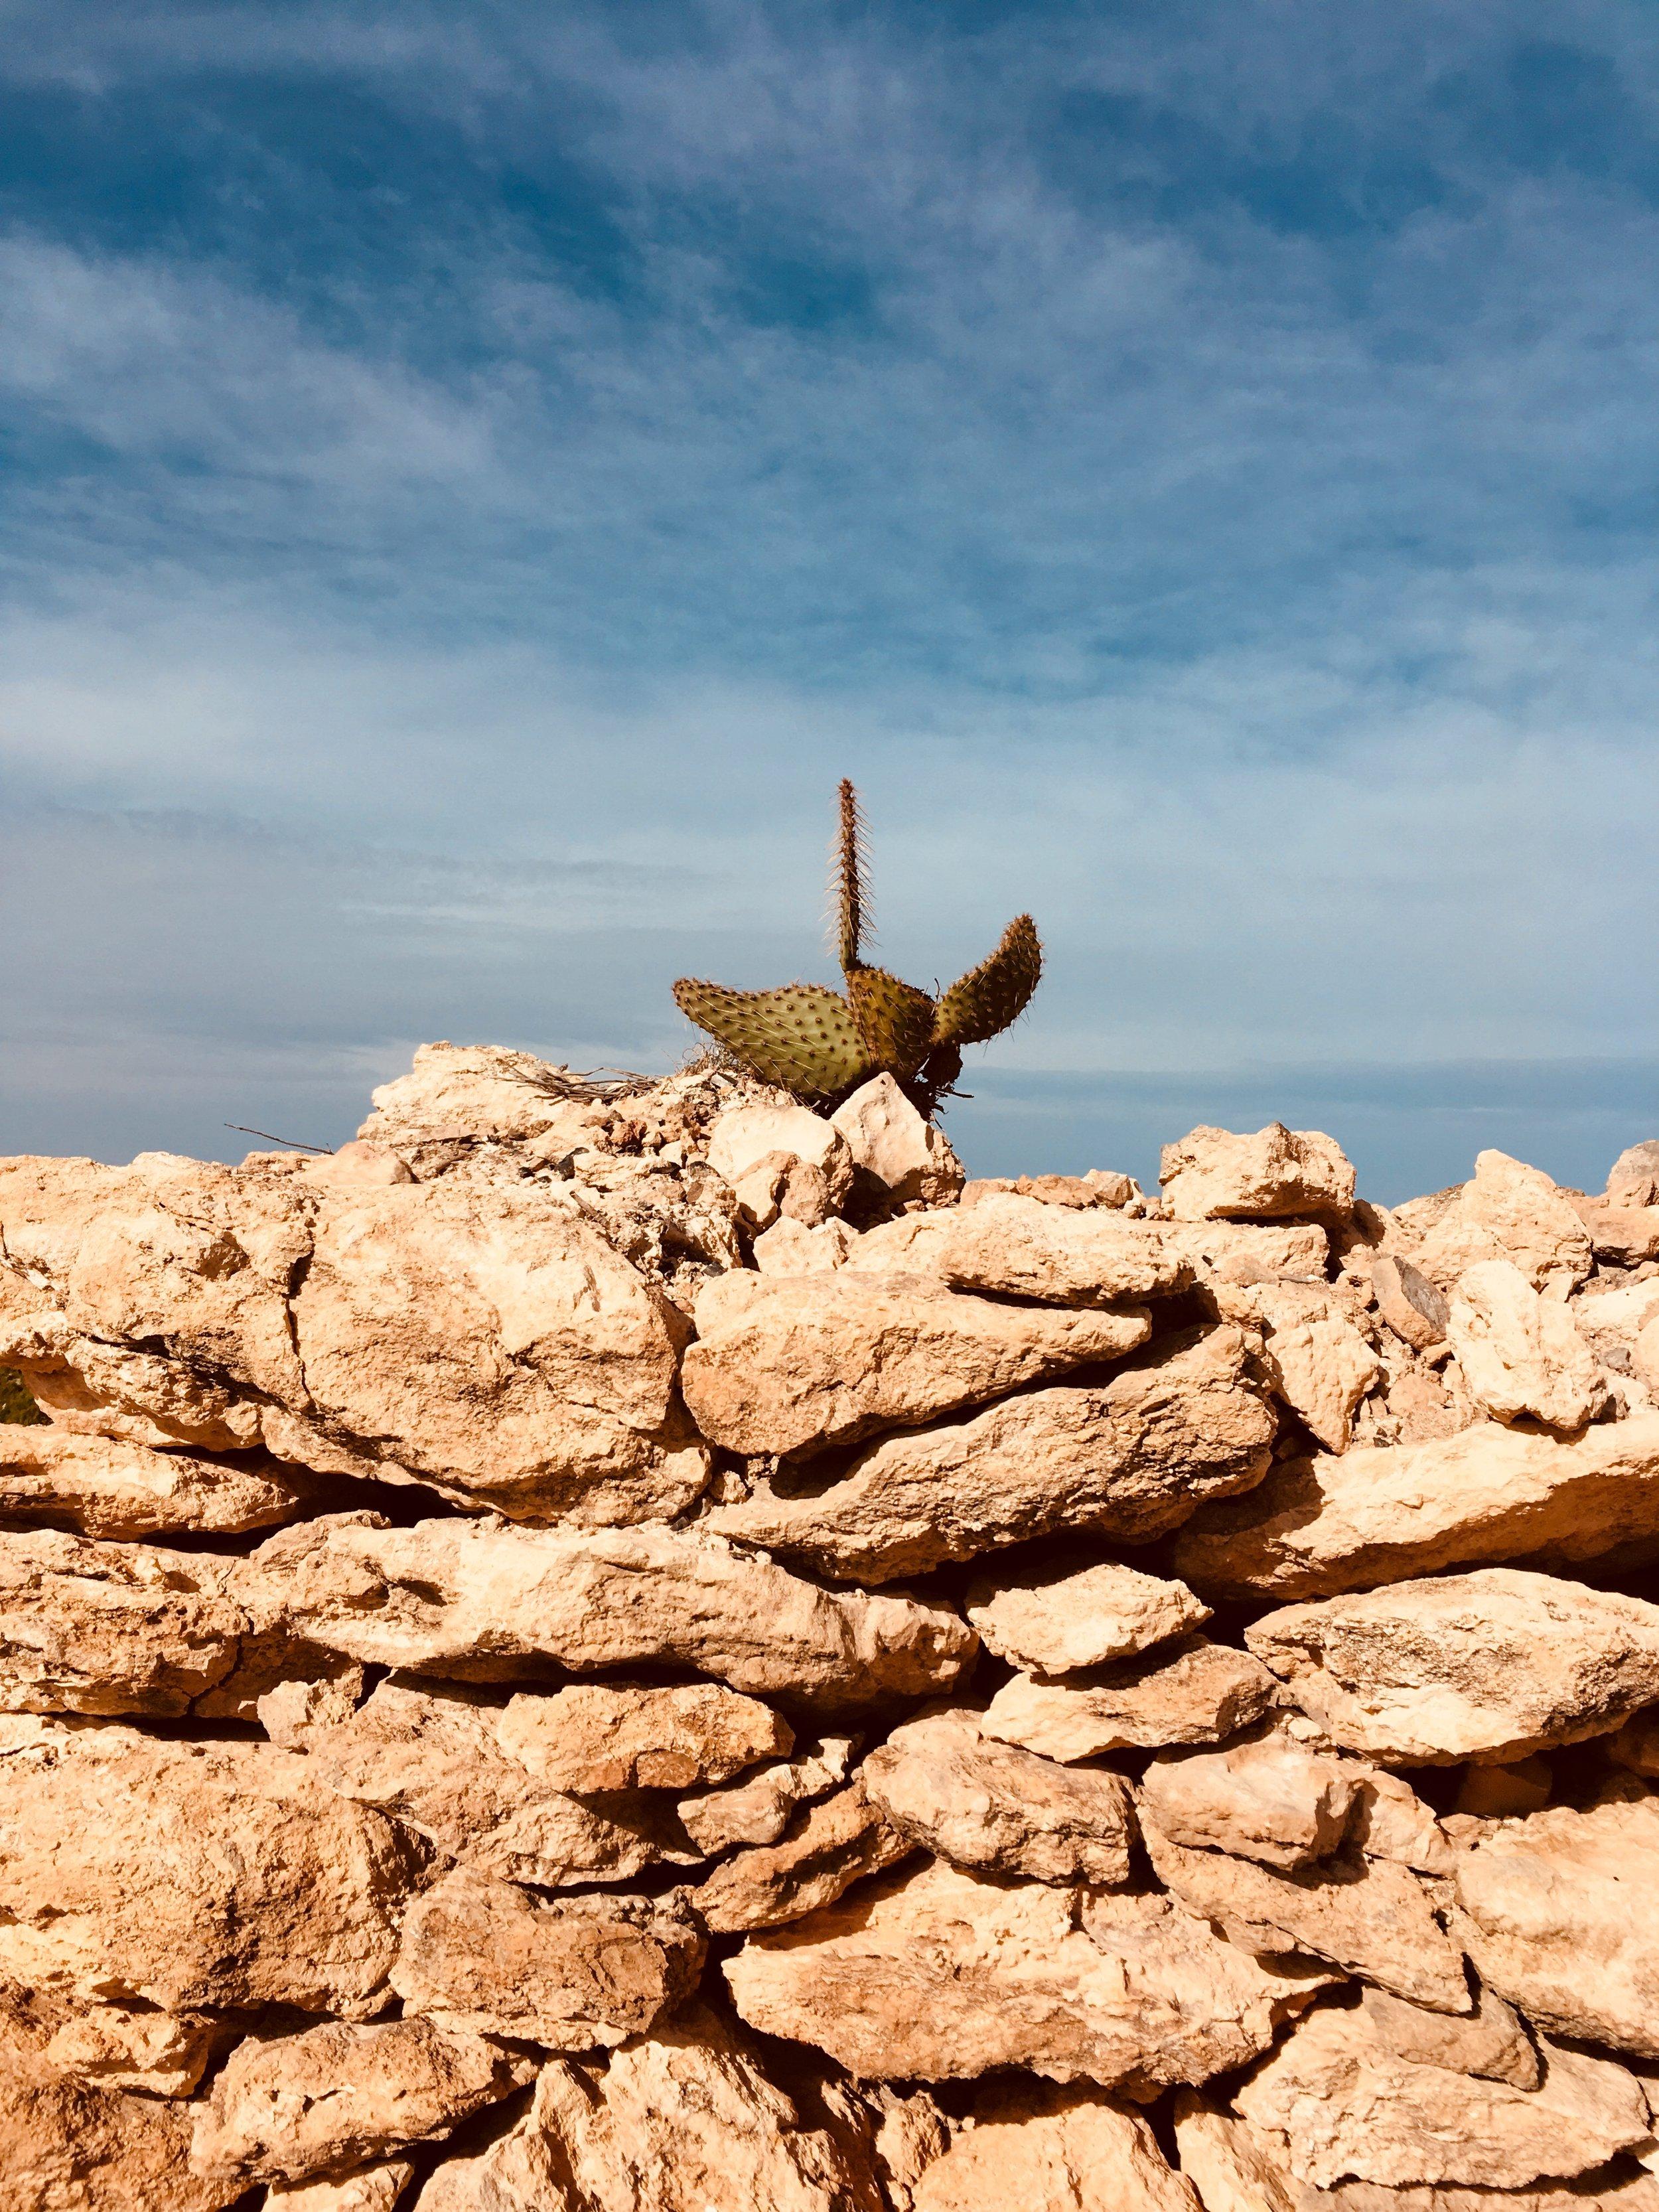 Wunderschöne Wanderung durch Ibizas Norden zum Punta de Xarracó. #wandern #ibiza #urlaub #balearen #urlaubstipps #geheimtipps